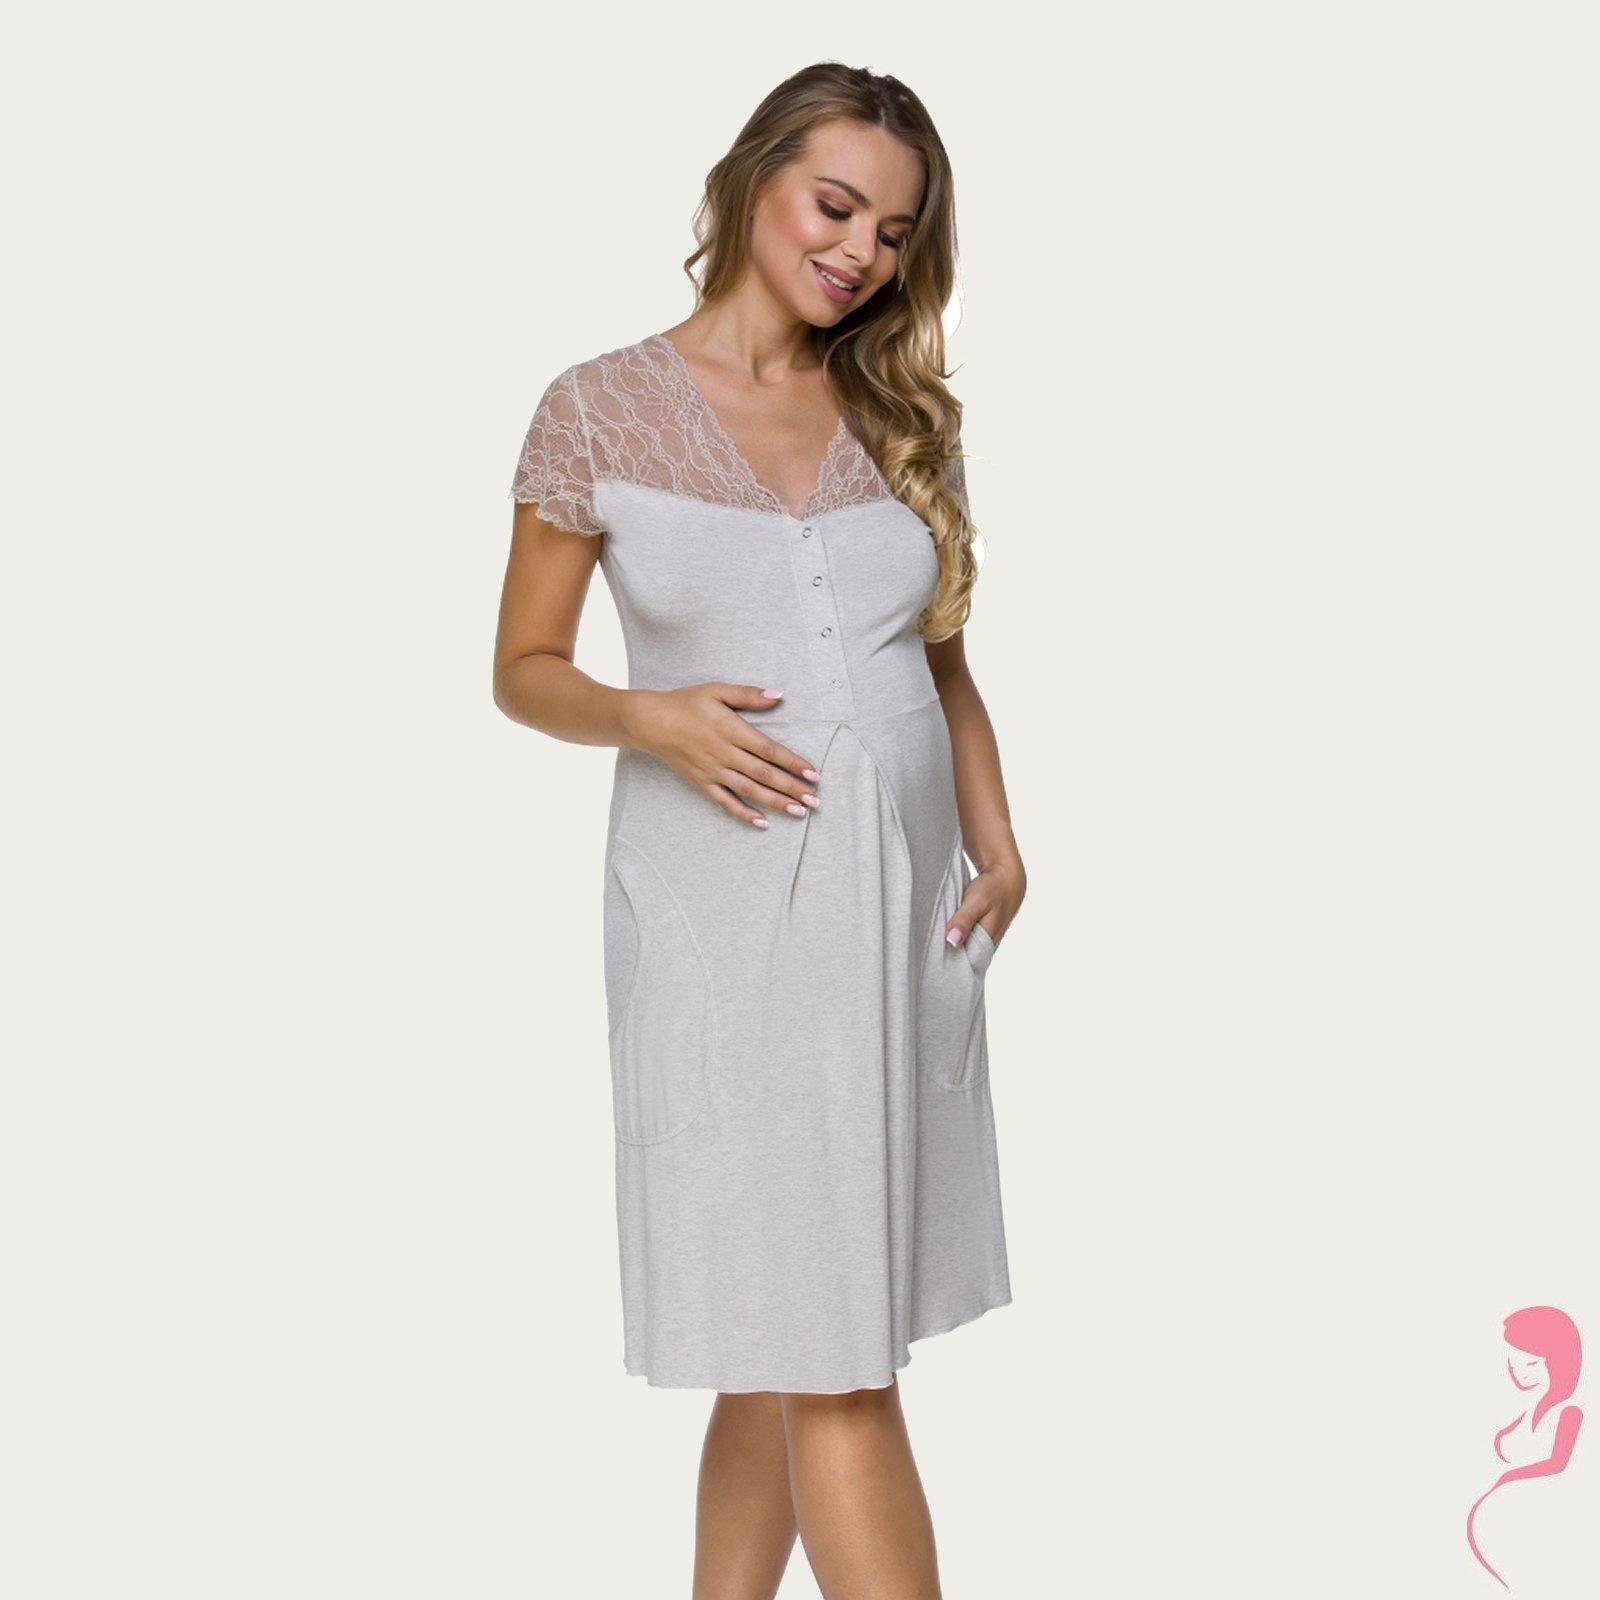 Lupoline Zwangerschapsjurk - Voedingsjurk Soft Nights